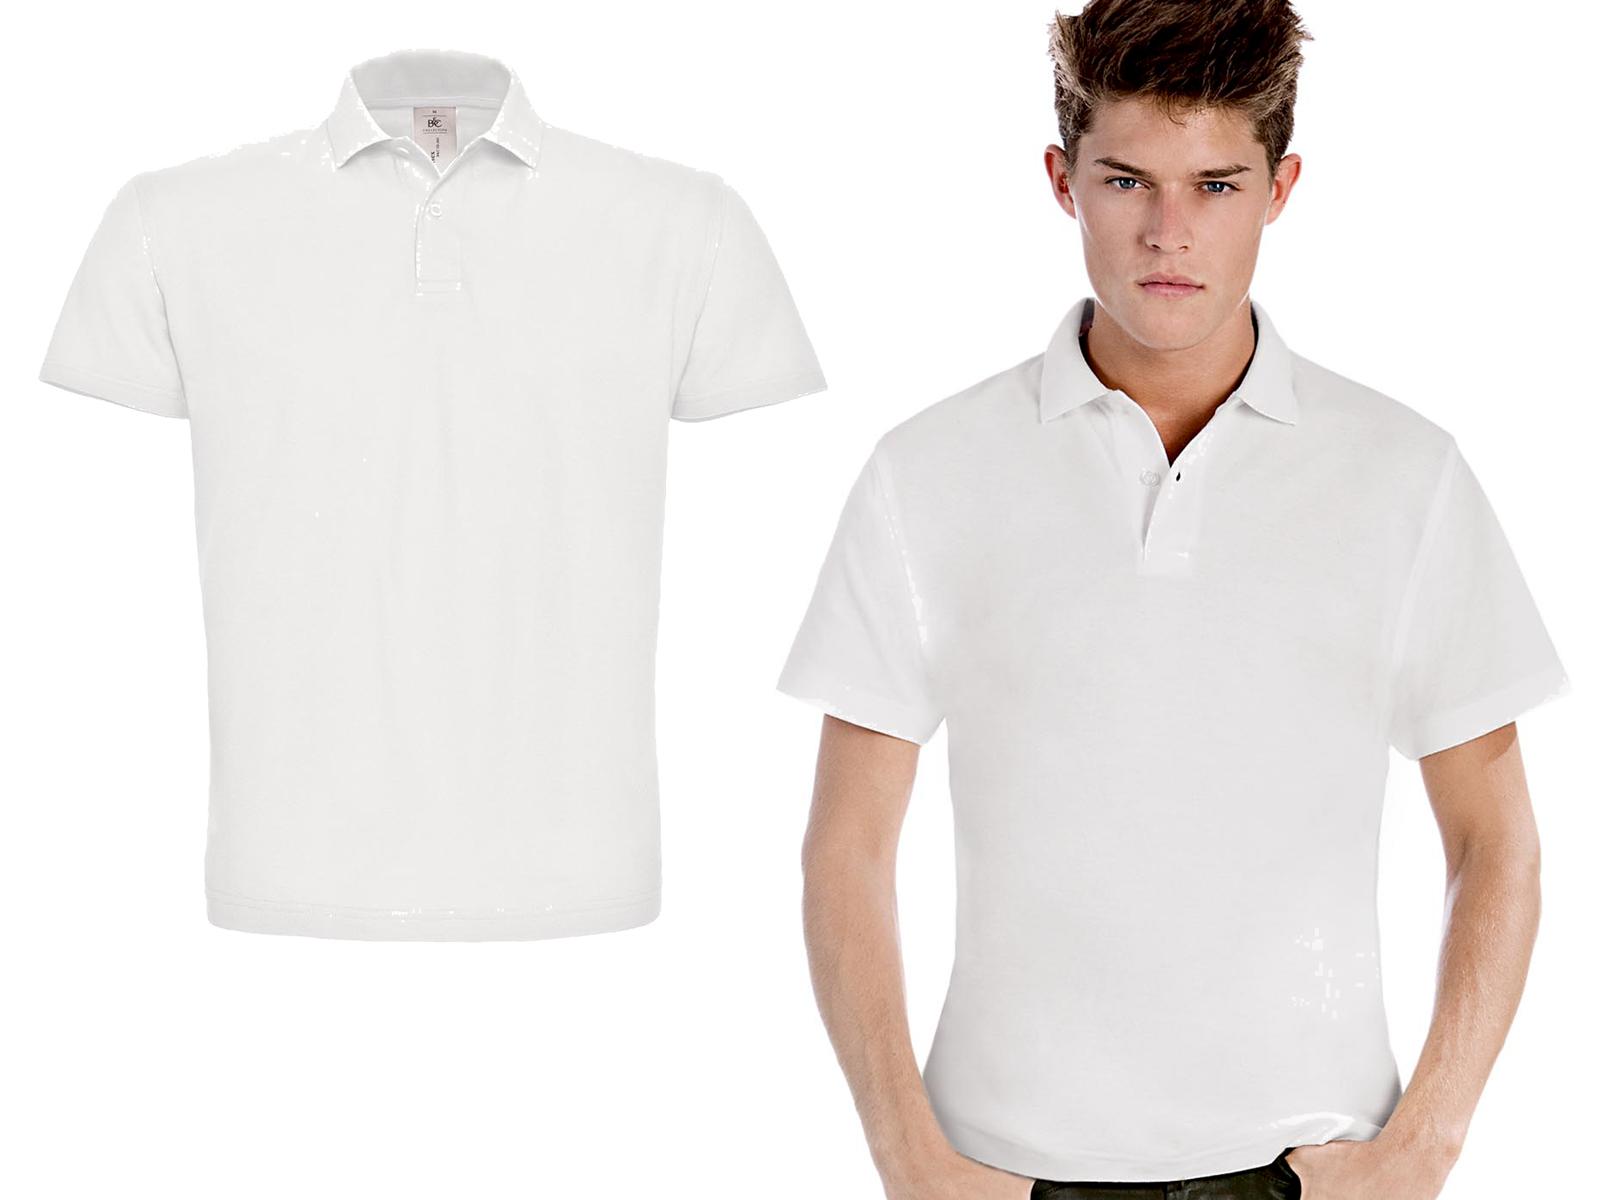 Koszulka Polo B C Id Bawełna Ring Spun S 5963294478 Allegro Pl